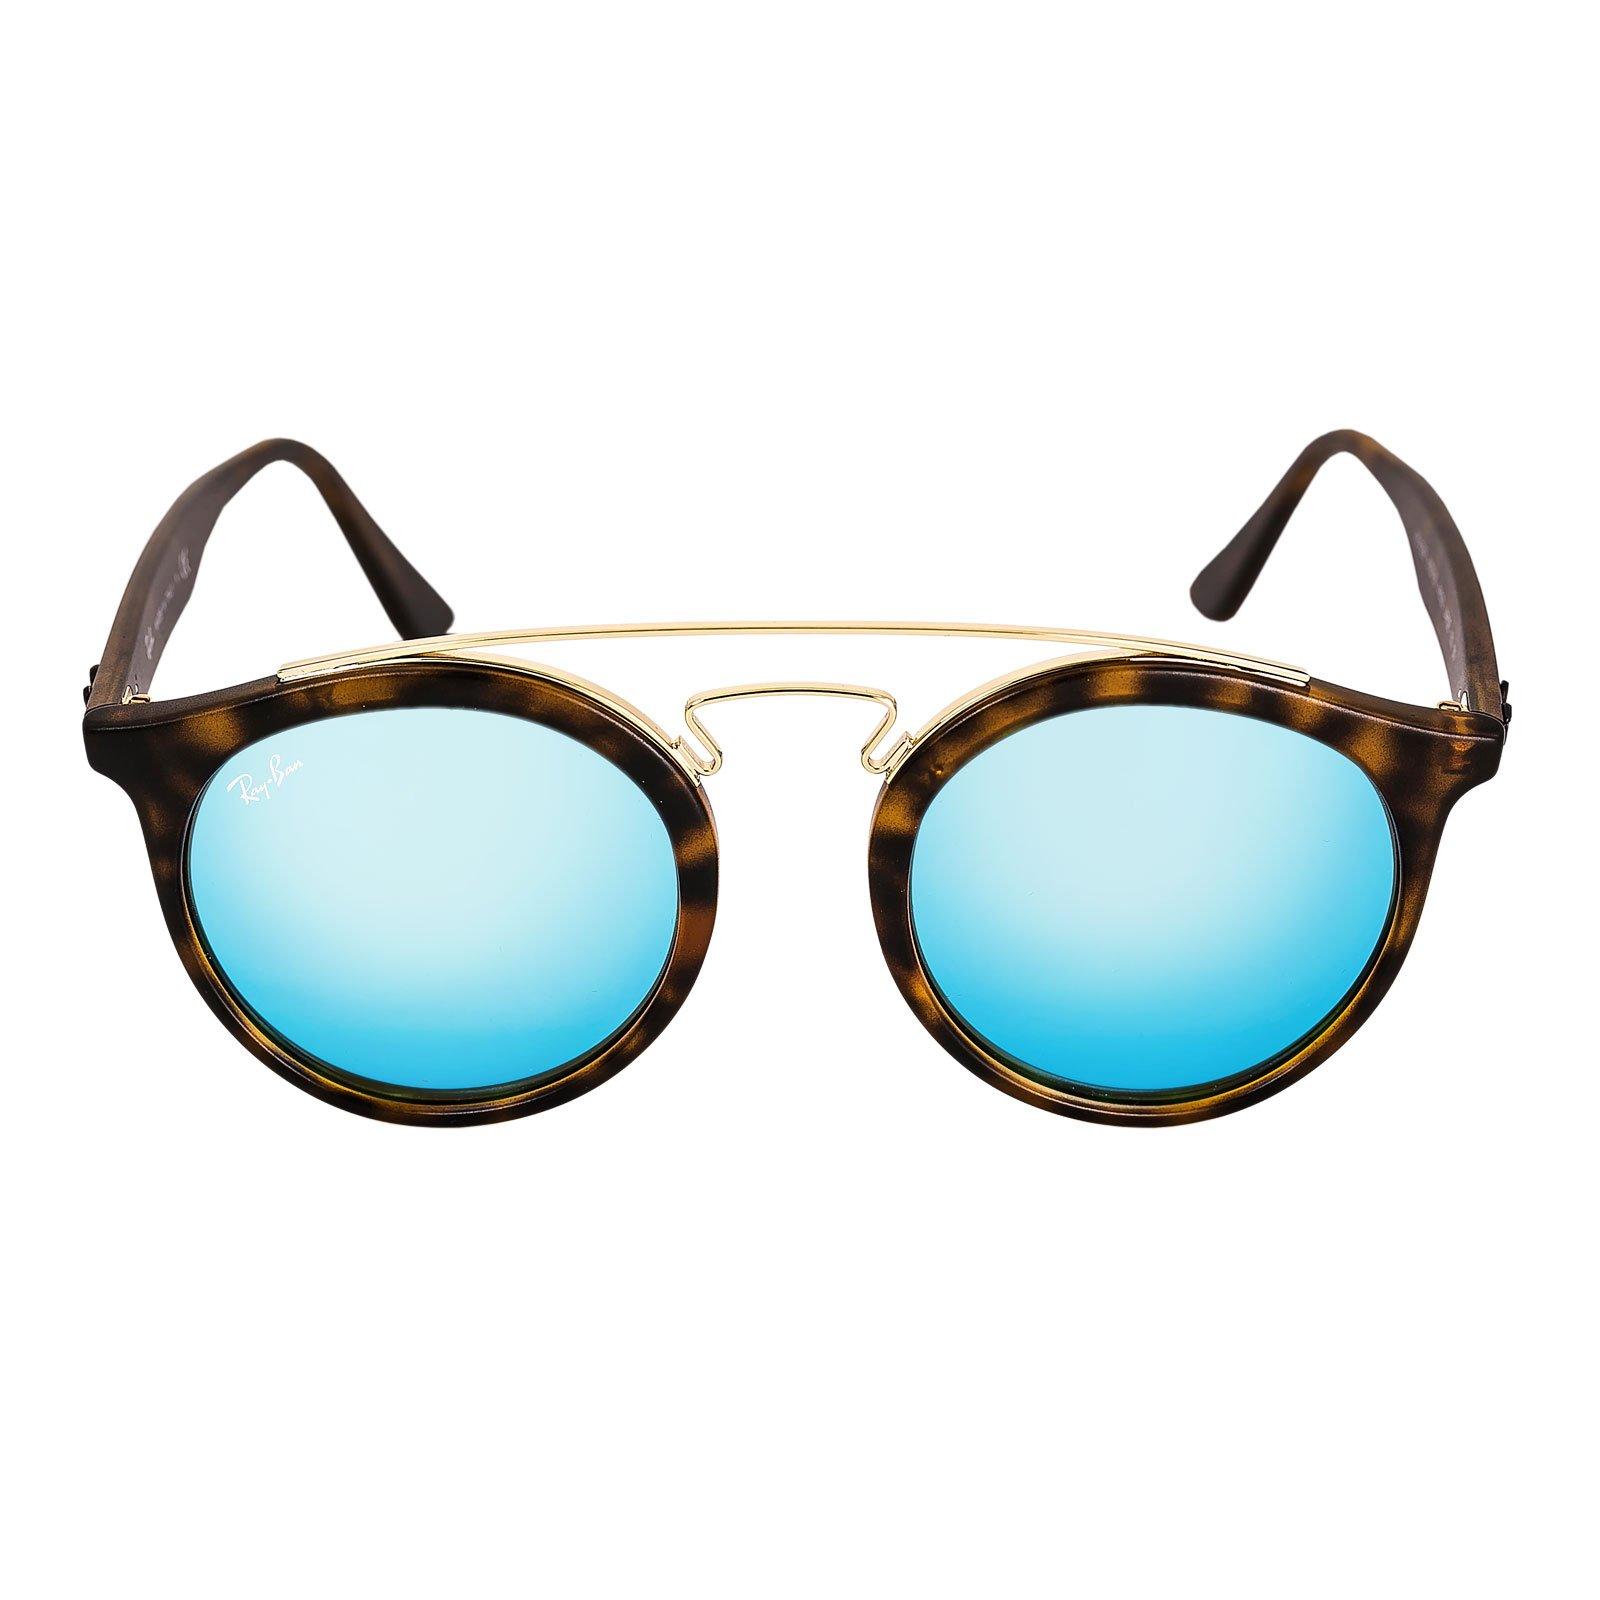 ray-ban tortoise sunglasses